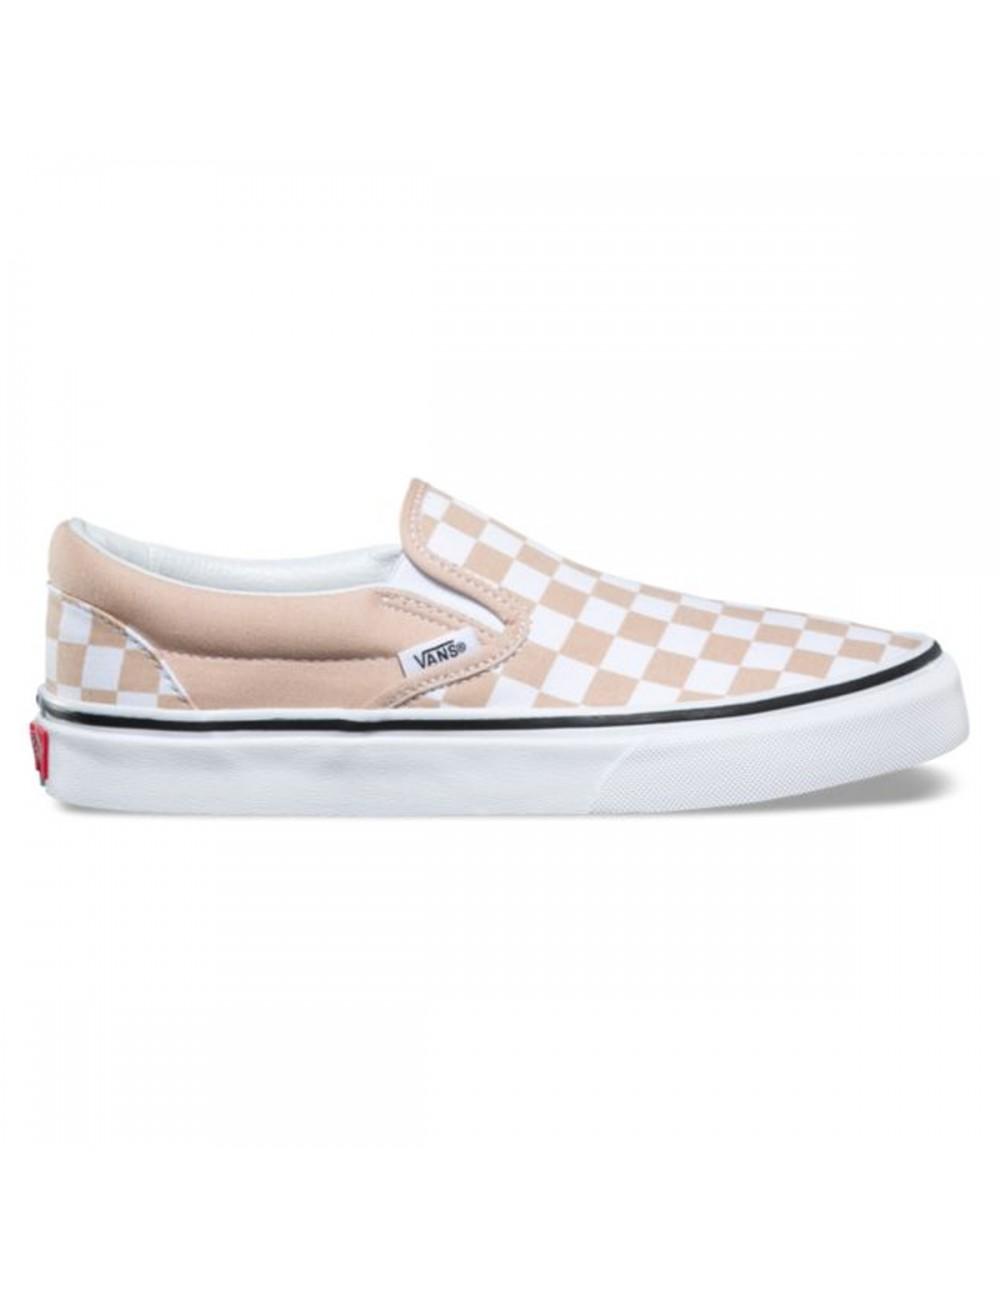 Vans Wms Classic Slip-On Shoe - Checkerboard_11479